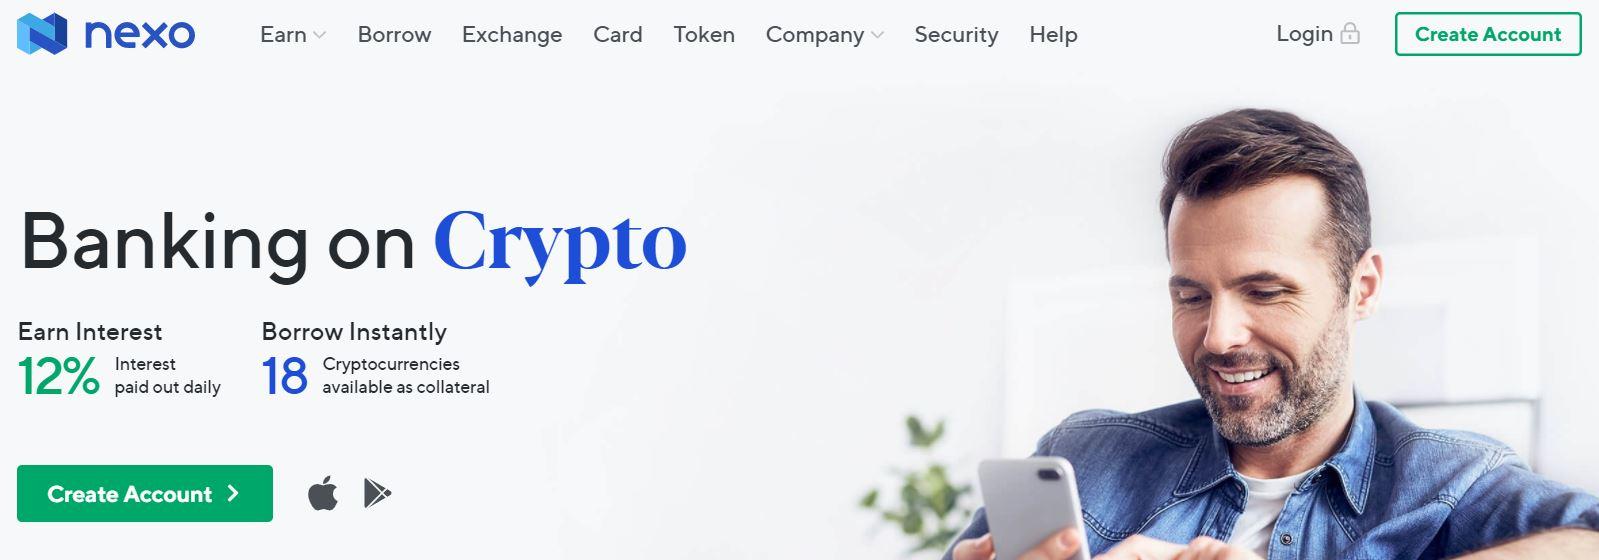 Cryptocurrency Nexo